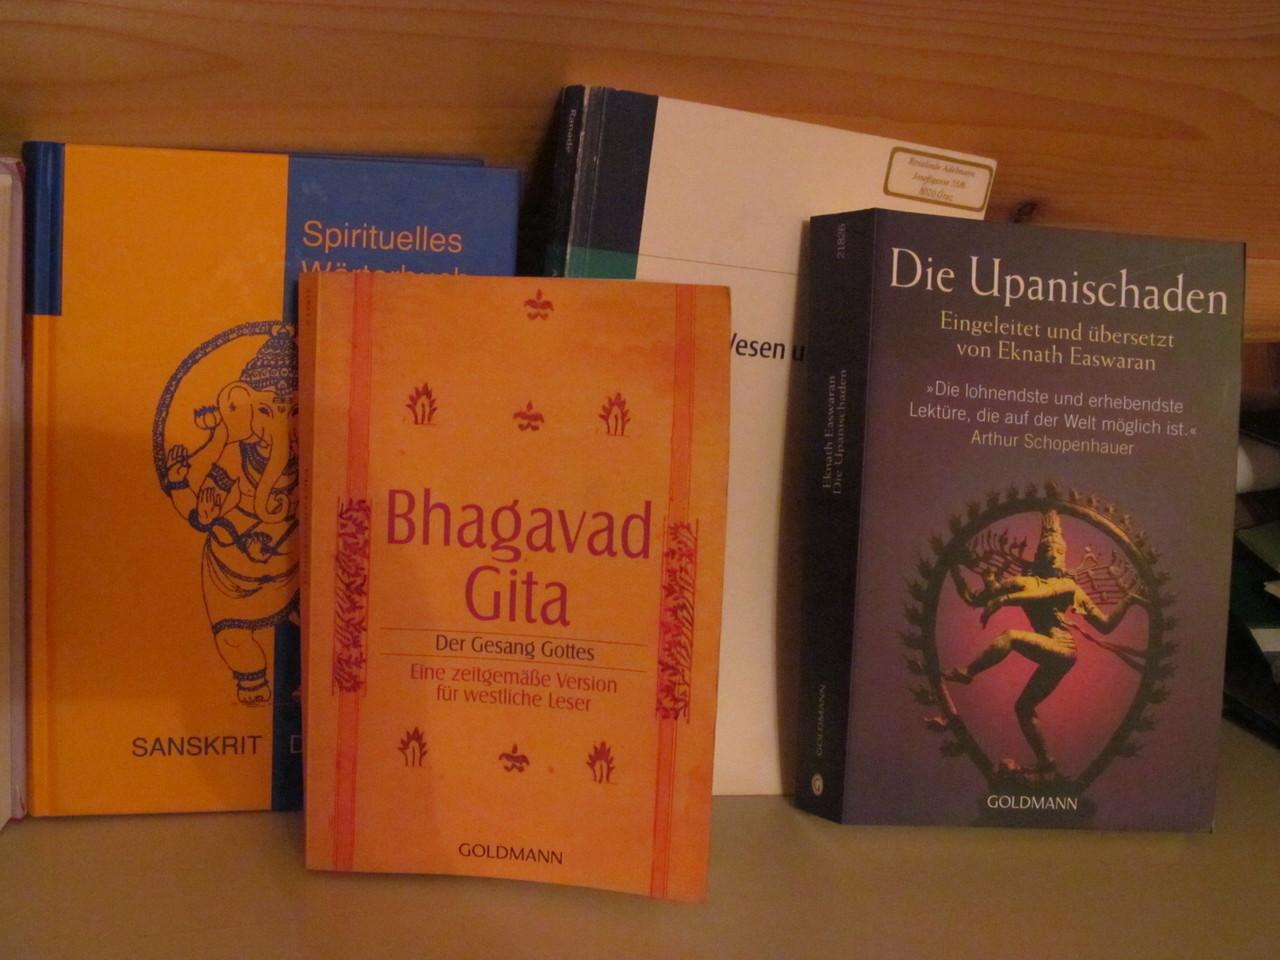 AyurvedaBücher: Bhagavad Gita, Upanishaden,...